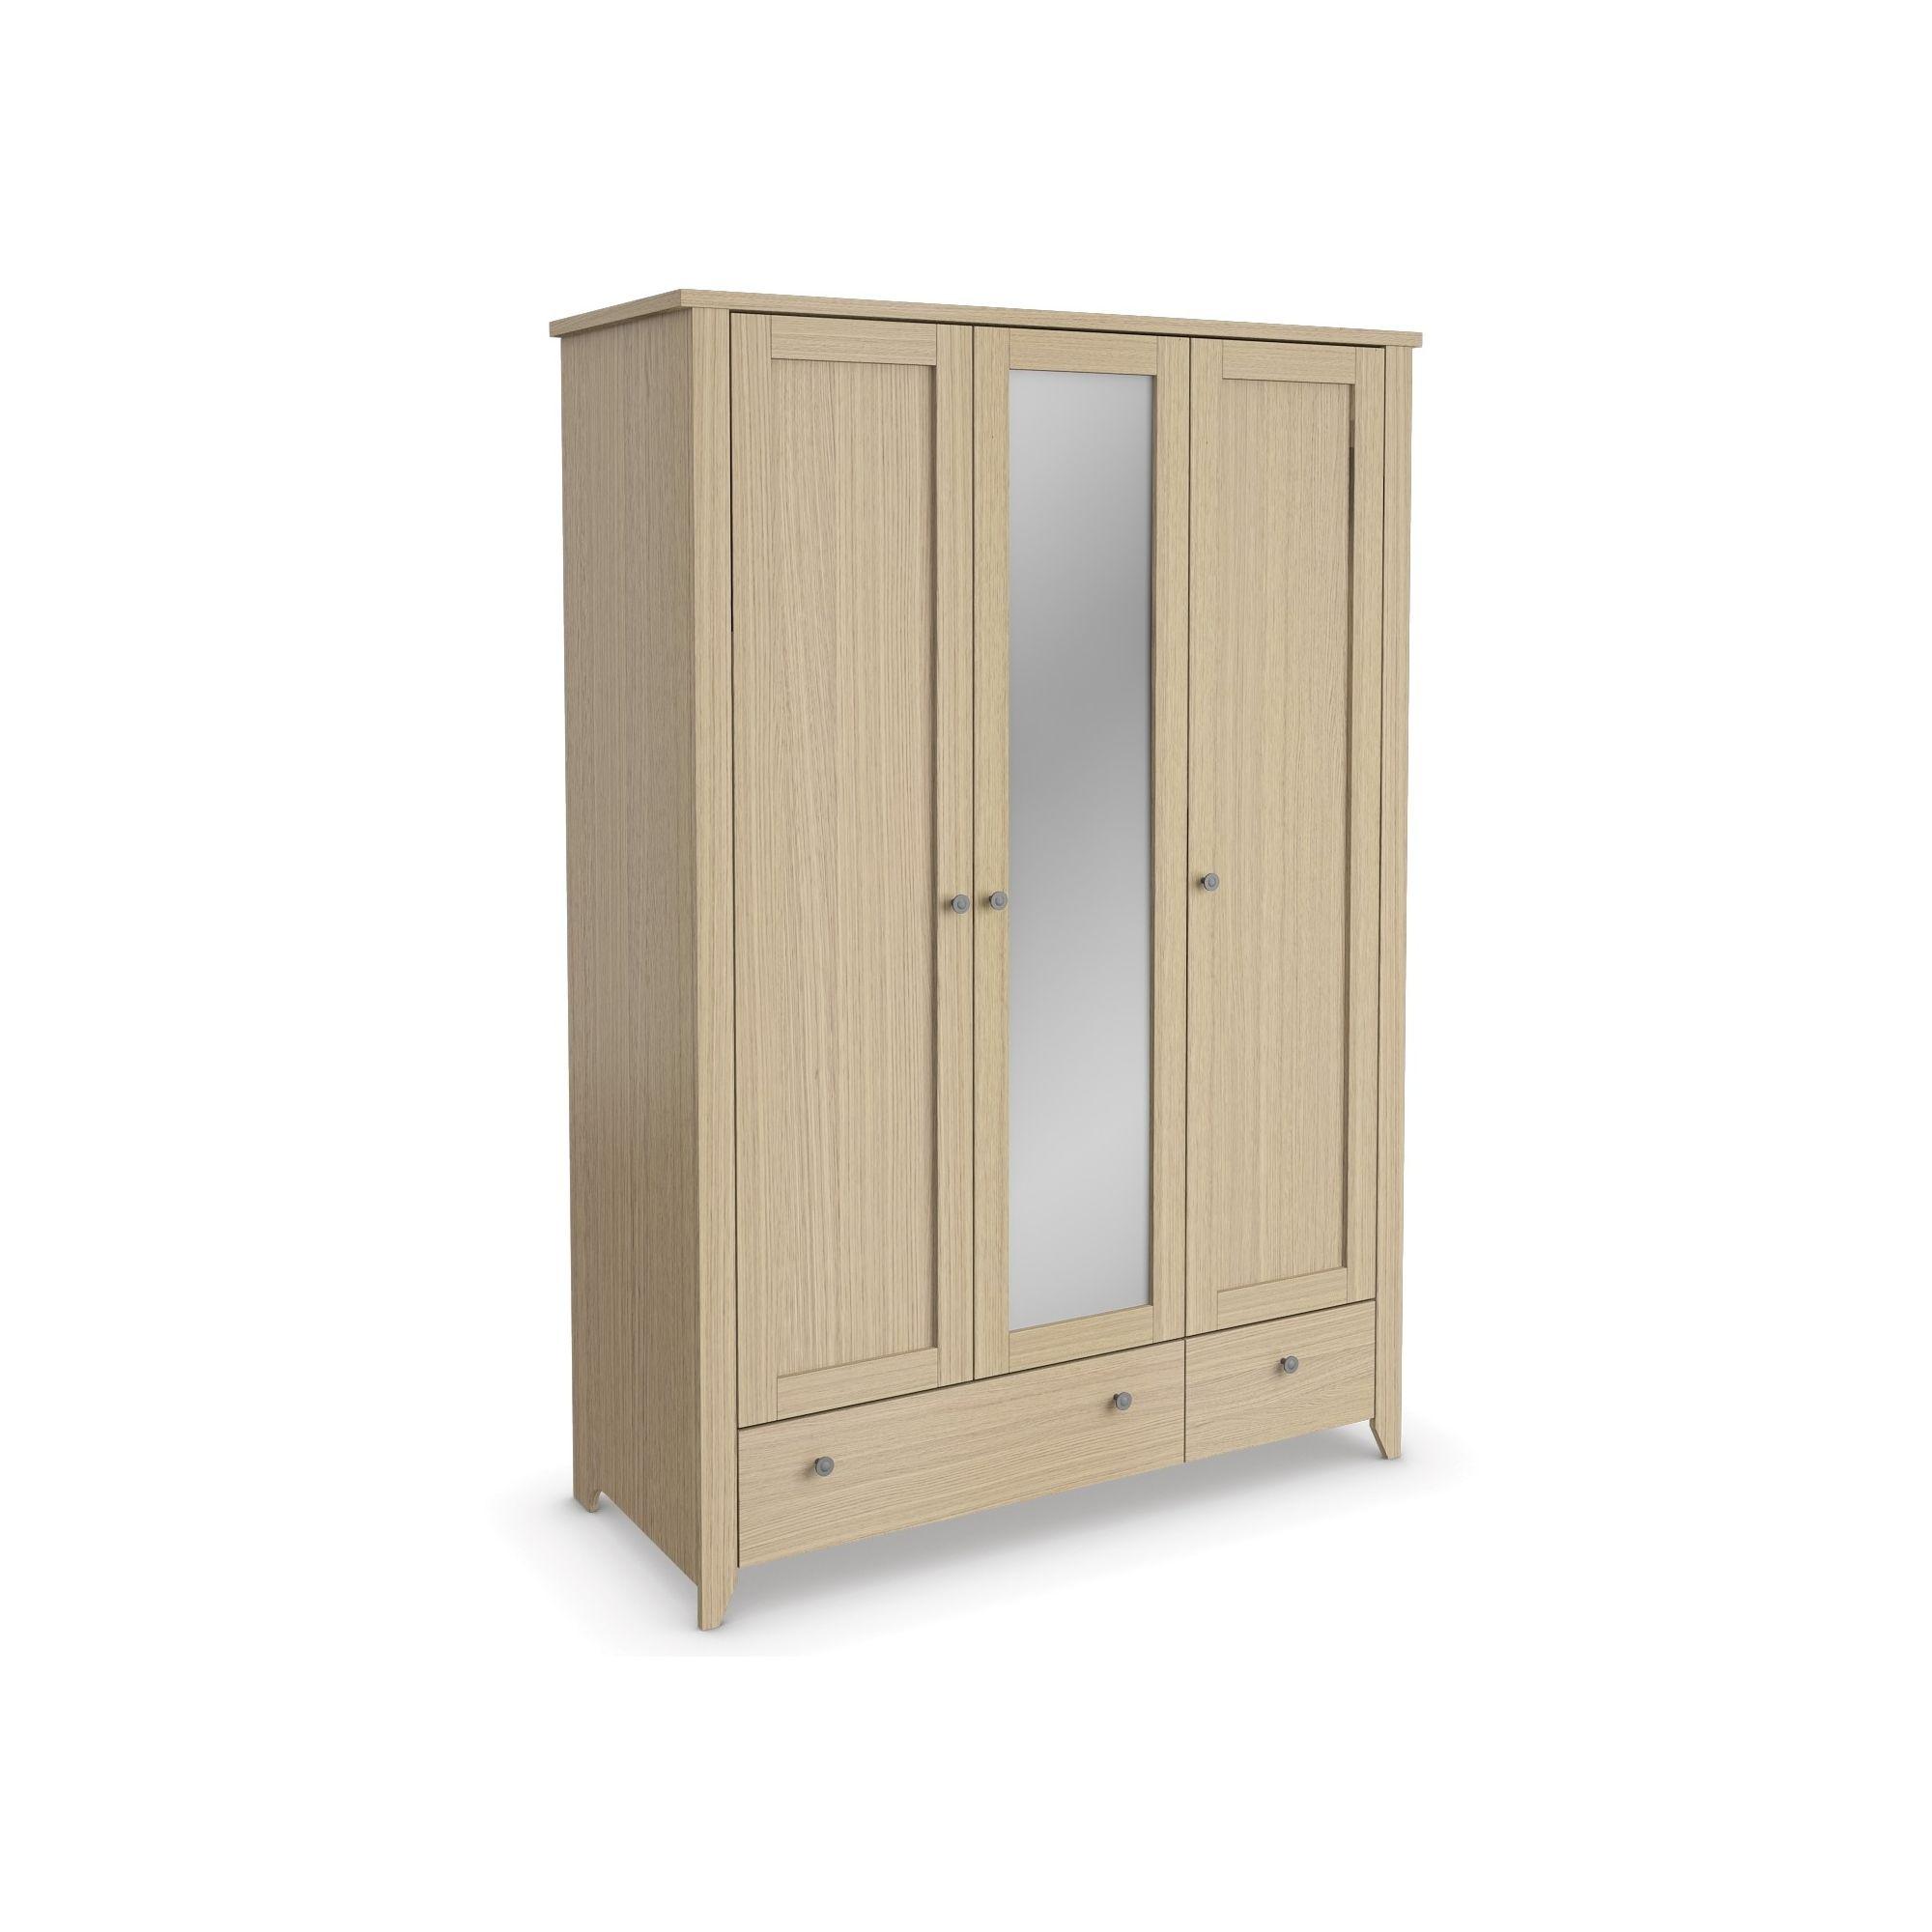 Urbane Designs Light Oak Bedroom 3 Door 1 Mirror + 2 Drawer Wardrobe at Tesco Direct